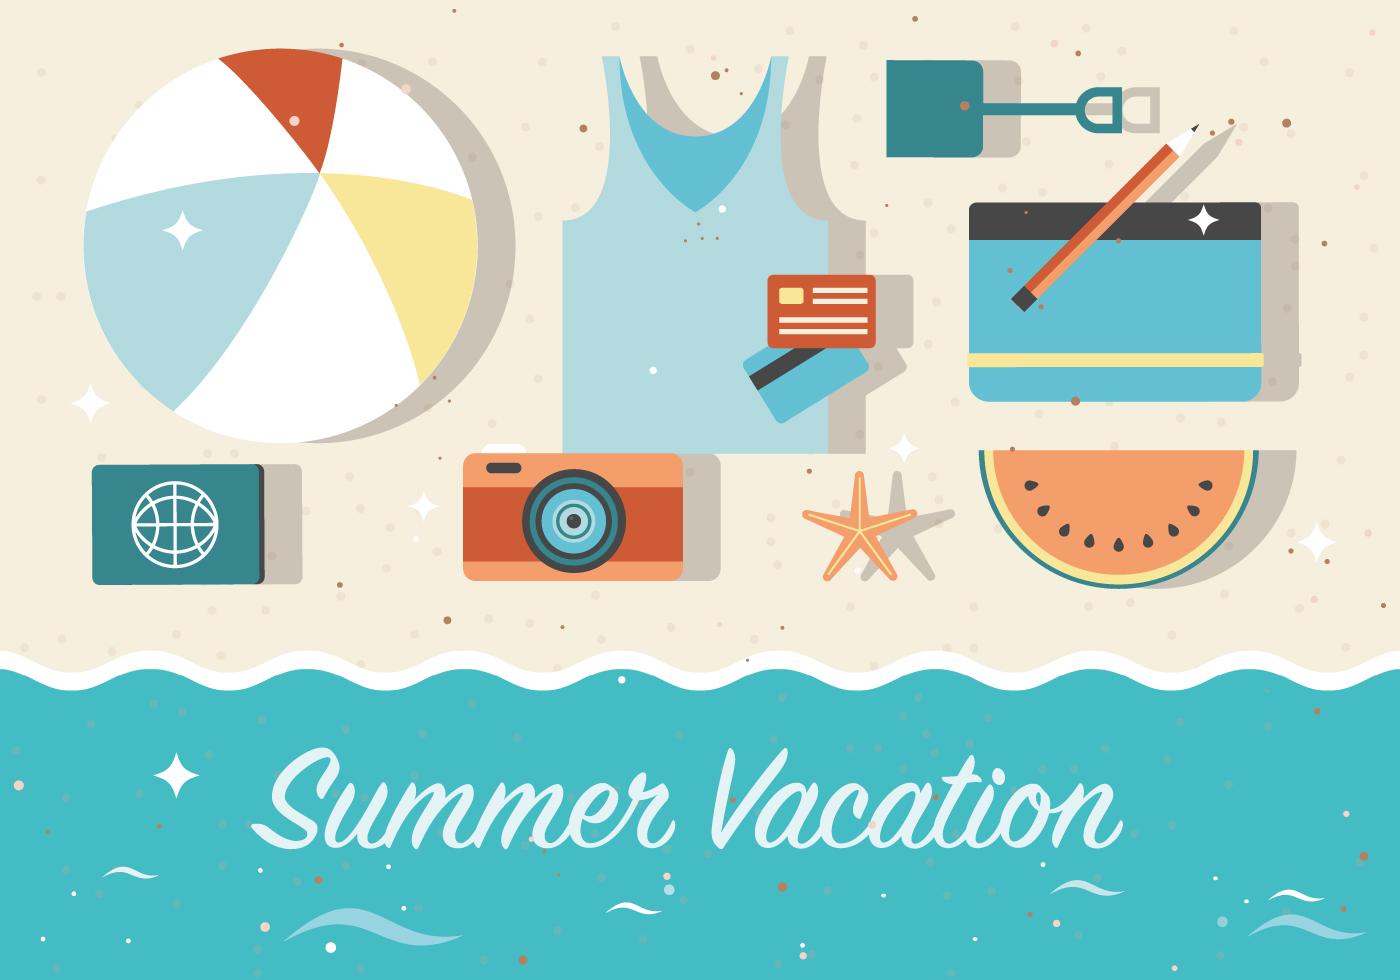 Free Summer Vacation Vector Background Download Free Vectors Clipart Graphics Vector Art